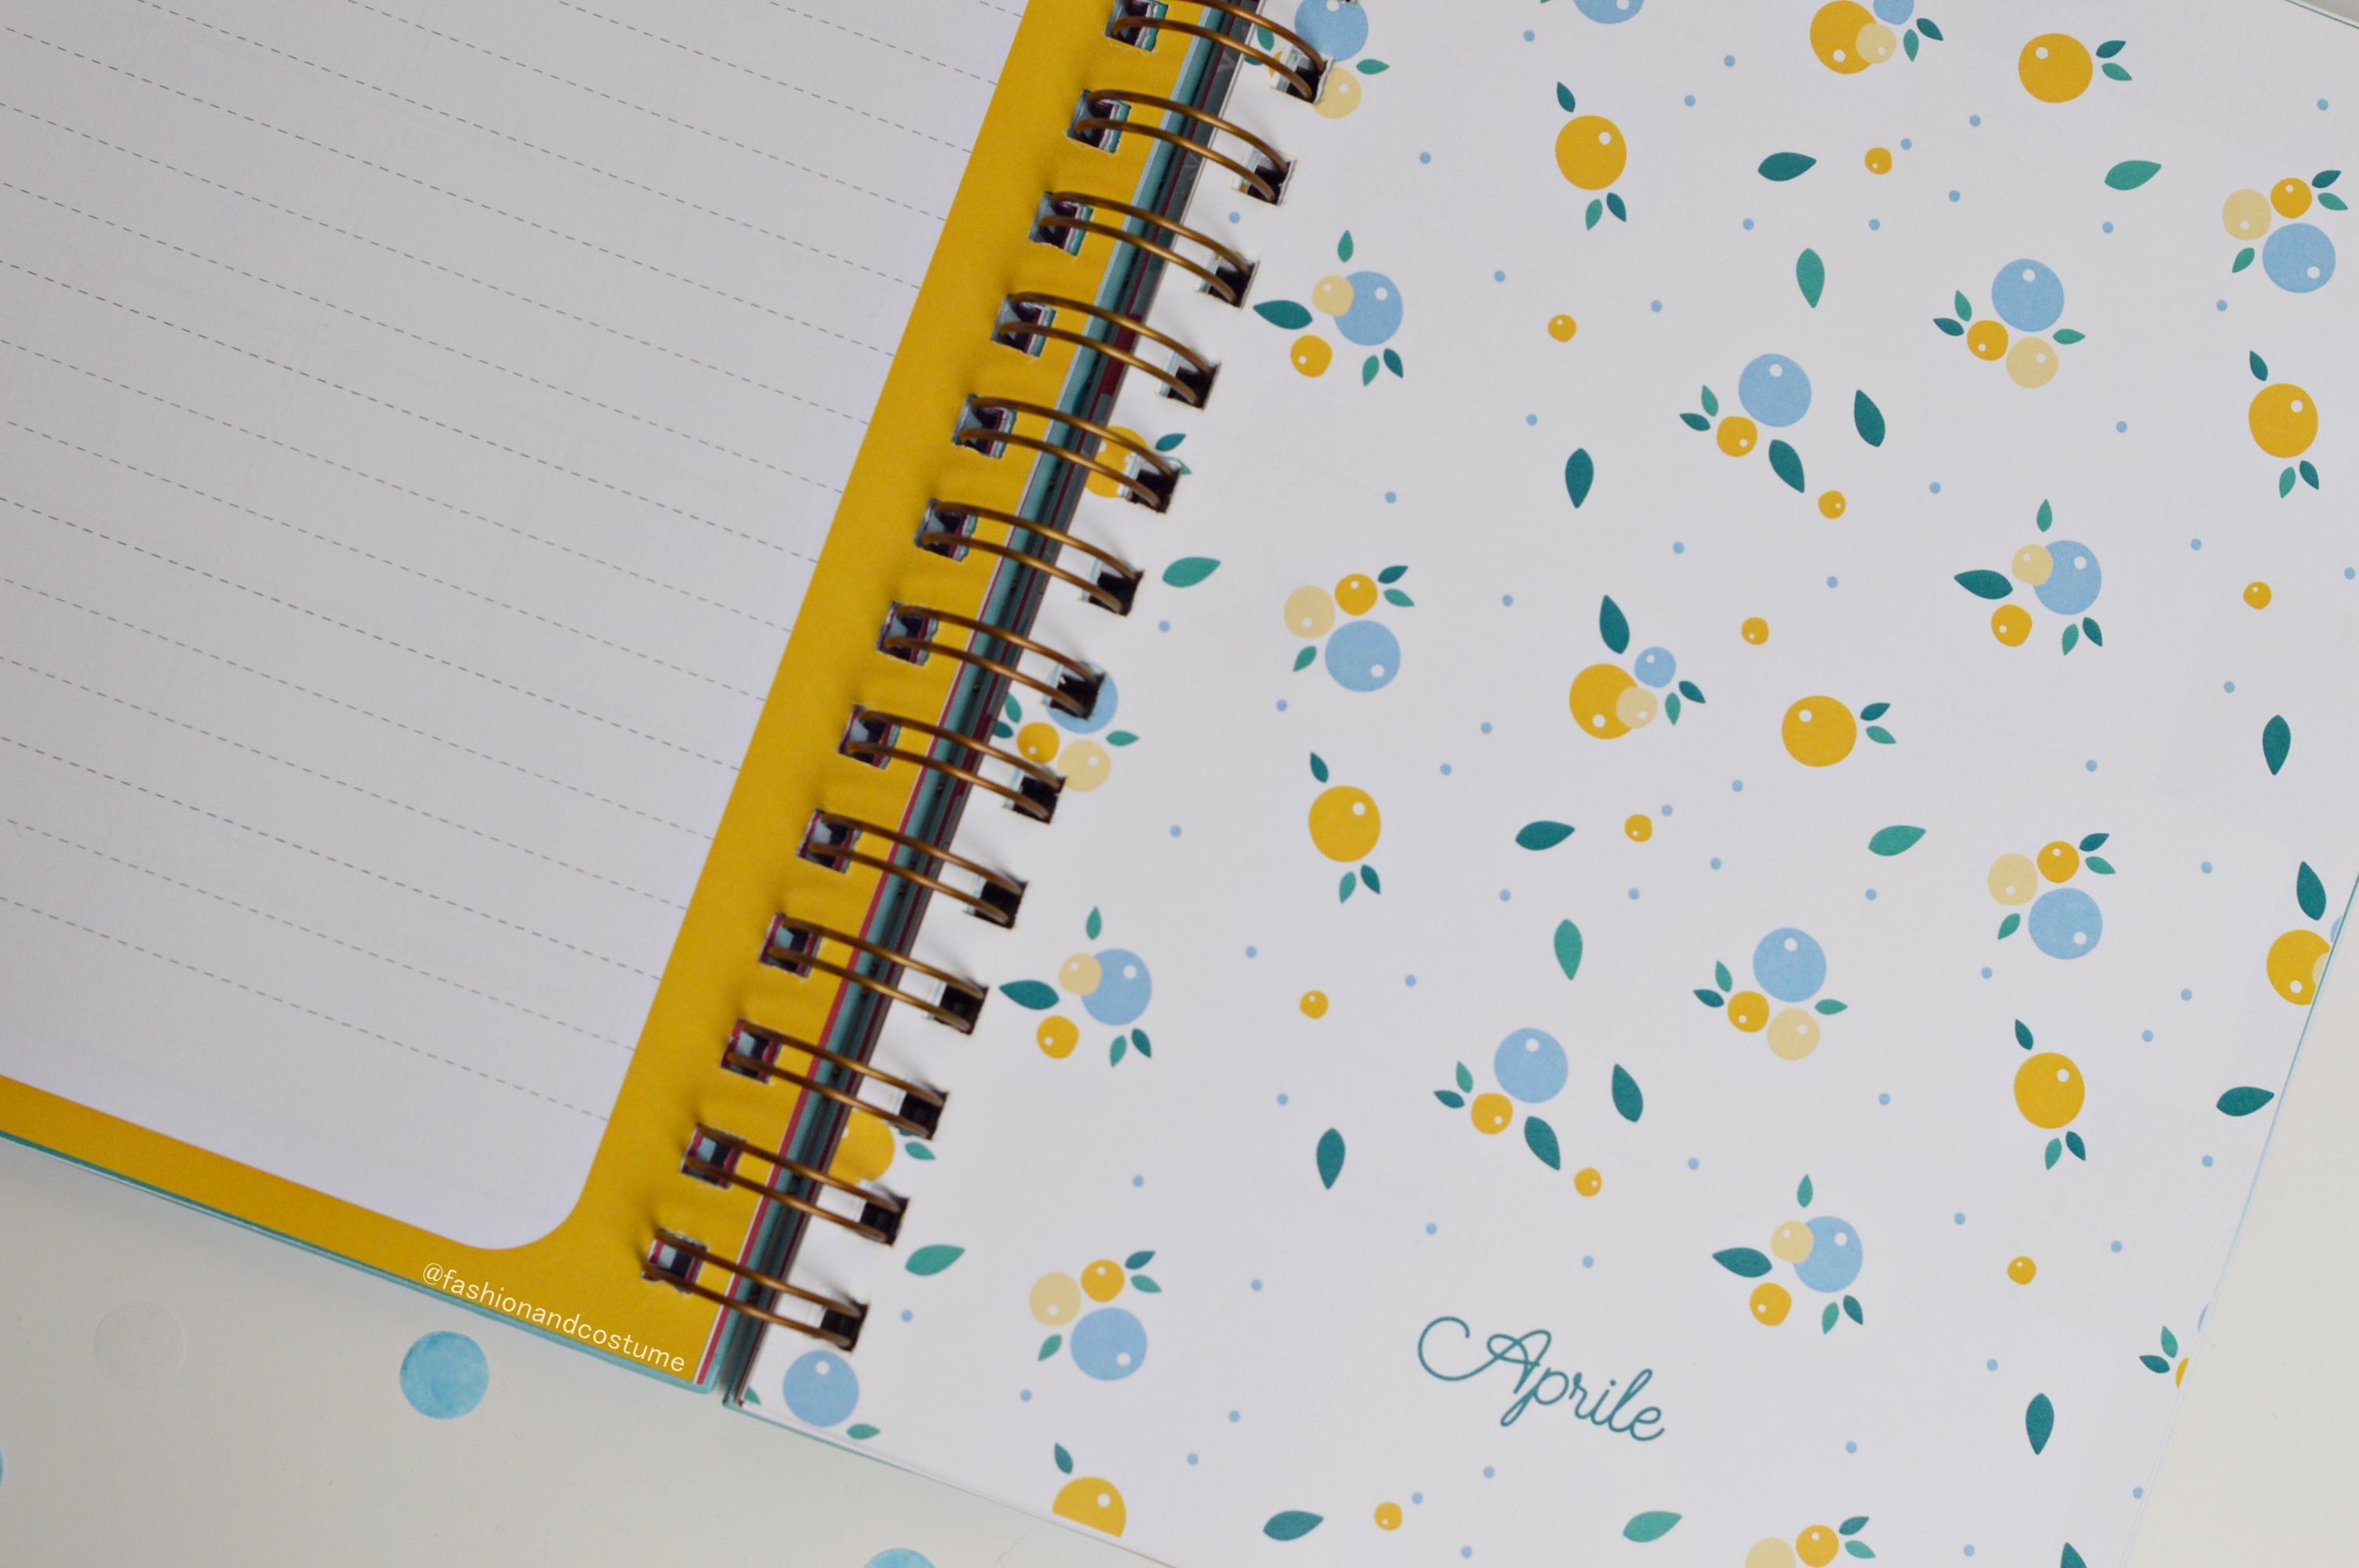 agenda-planner-2019-settimanale-weekly-giulia-lepetitrabbit-le-petit-rabbit-fashion-and-costume-fashionandcostume-graphic-designer-sticker-torino